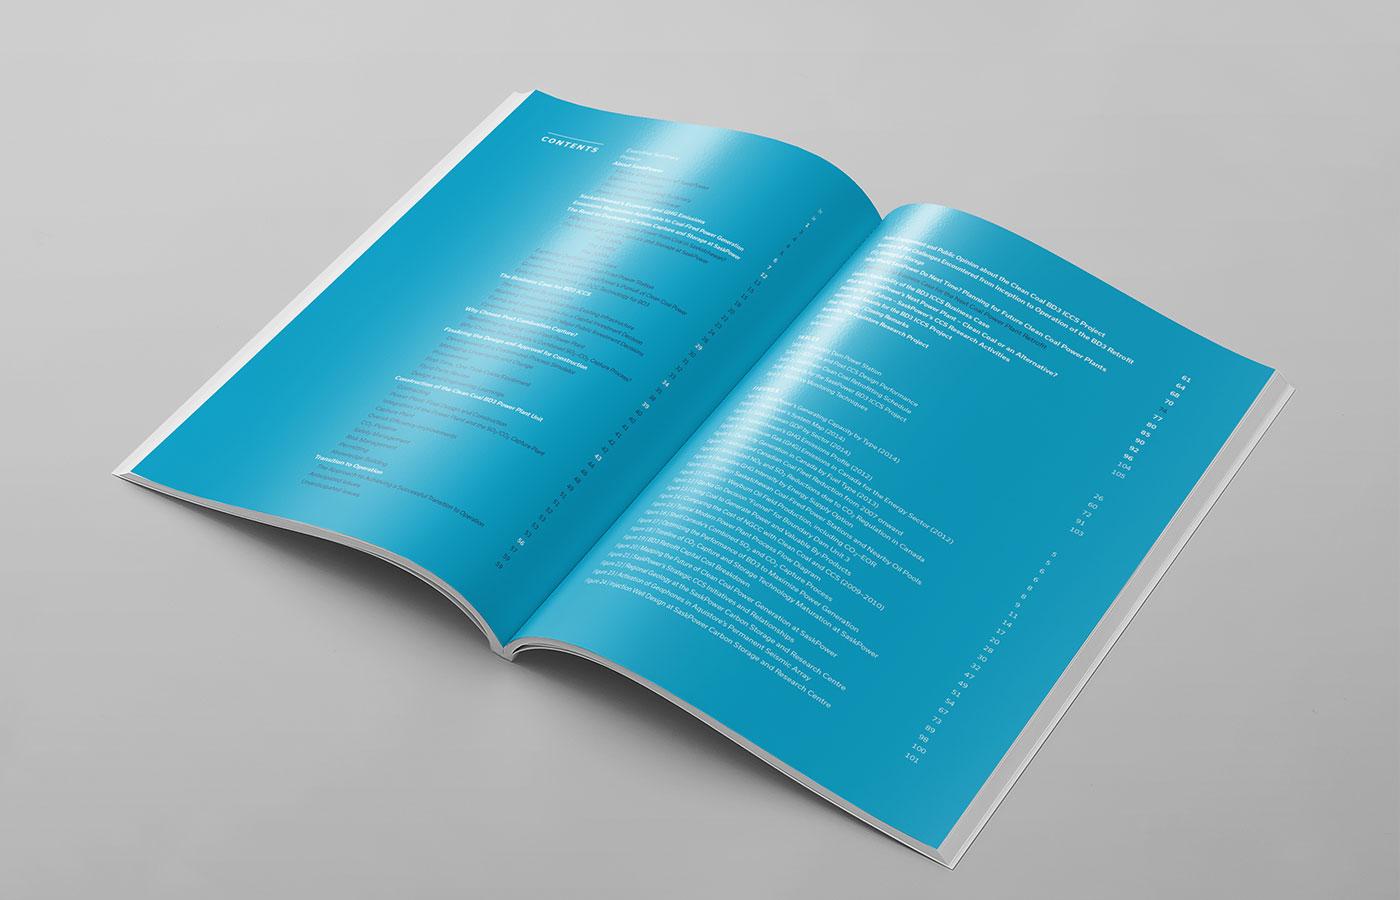 covetdesign_logo-design_branding_brochure-design_graphic-designer_vancouver_print_saskpower3